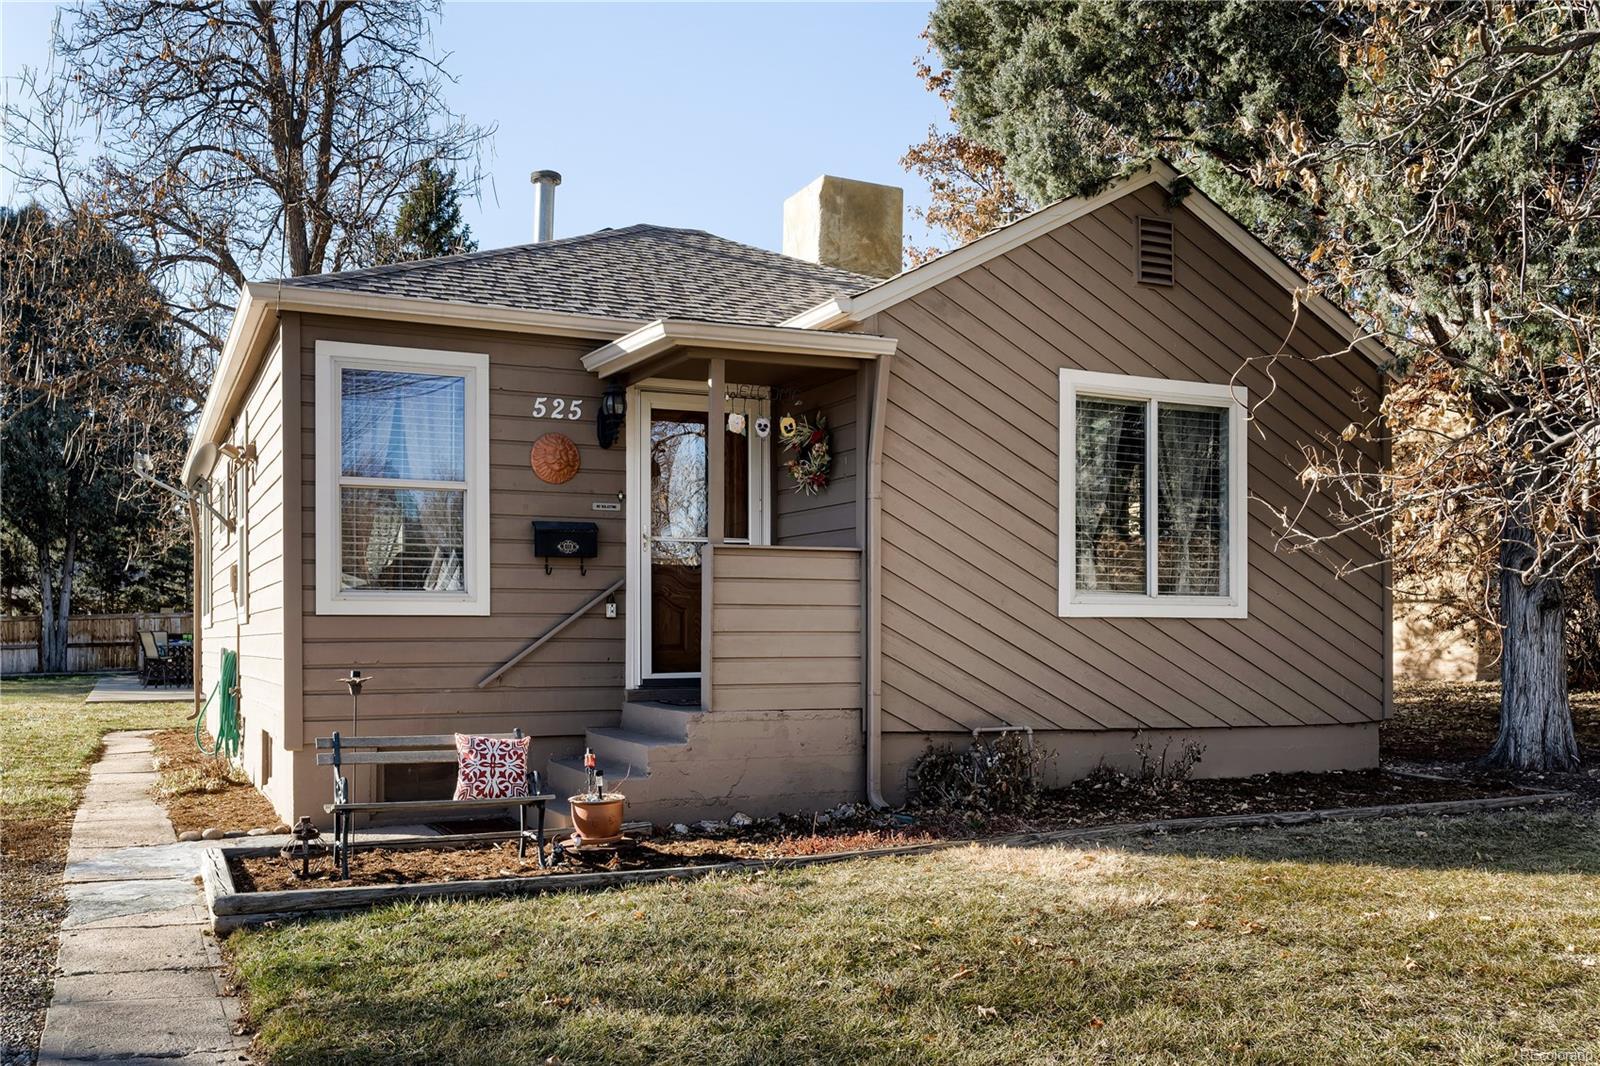 525 City Park Avenue, Fort Collins, CO 80521 - Fort Collins, CO real estate listing